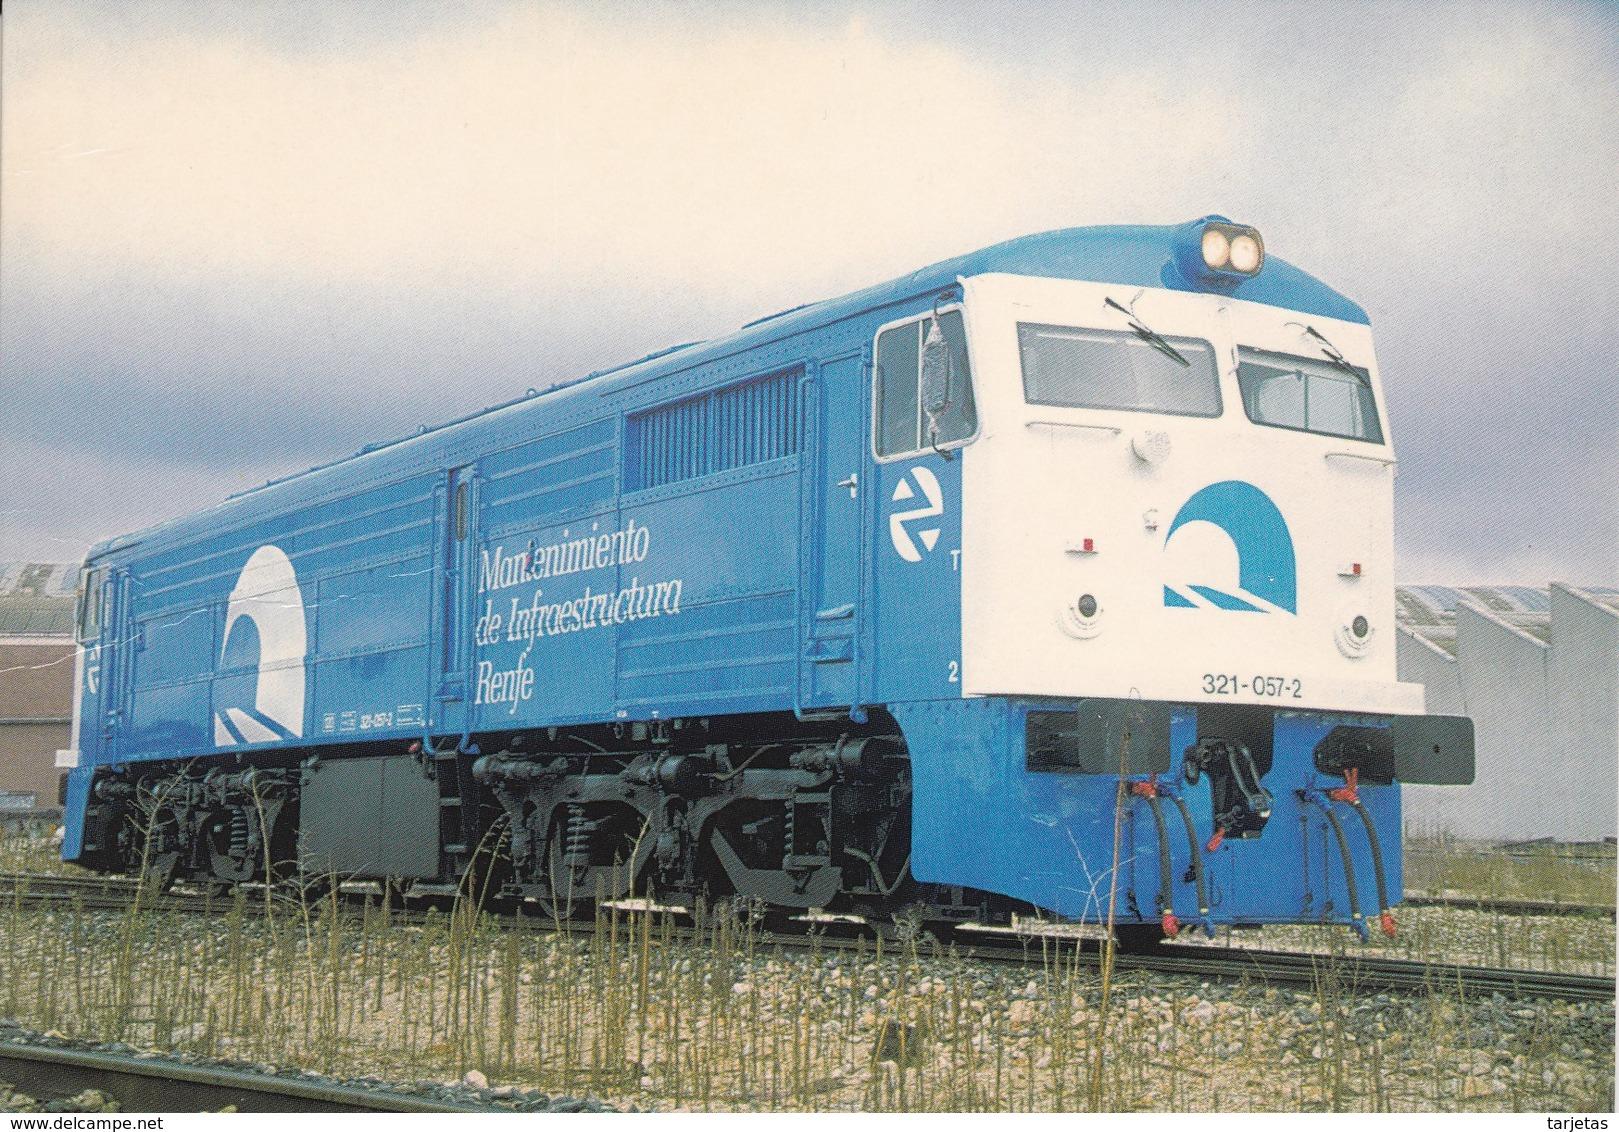 Nº 883 POSTAL DE LOCOMOTORA DIESEL ELECTRICA 321.057 EN VILLAVERDE BAJO (TREN-TRAIN-ZUG) AMICS DEL FERROCARRIL - Trenes